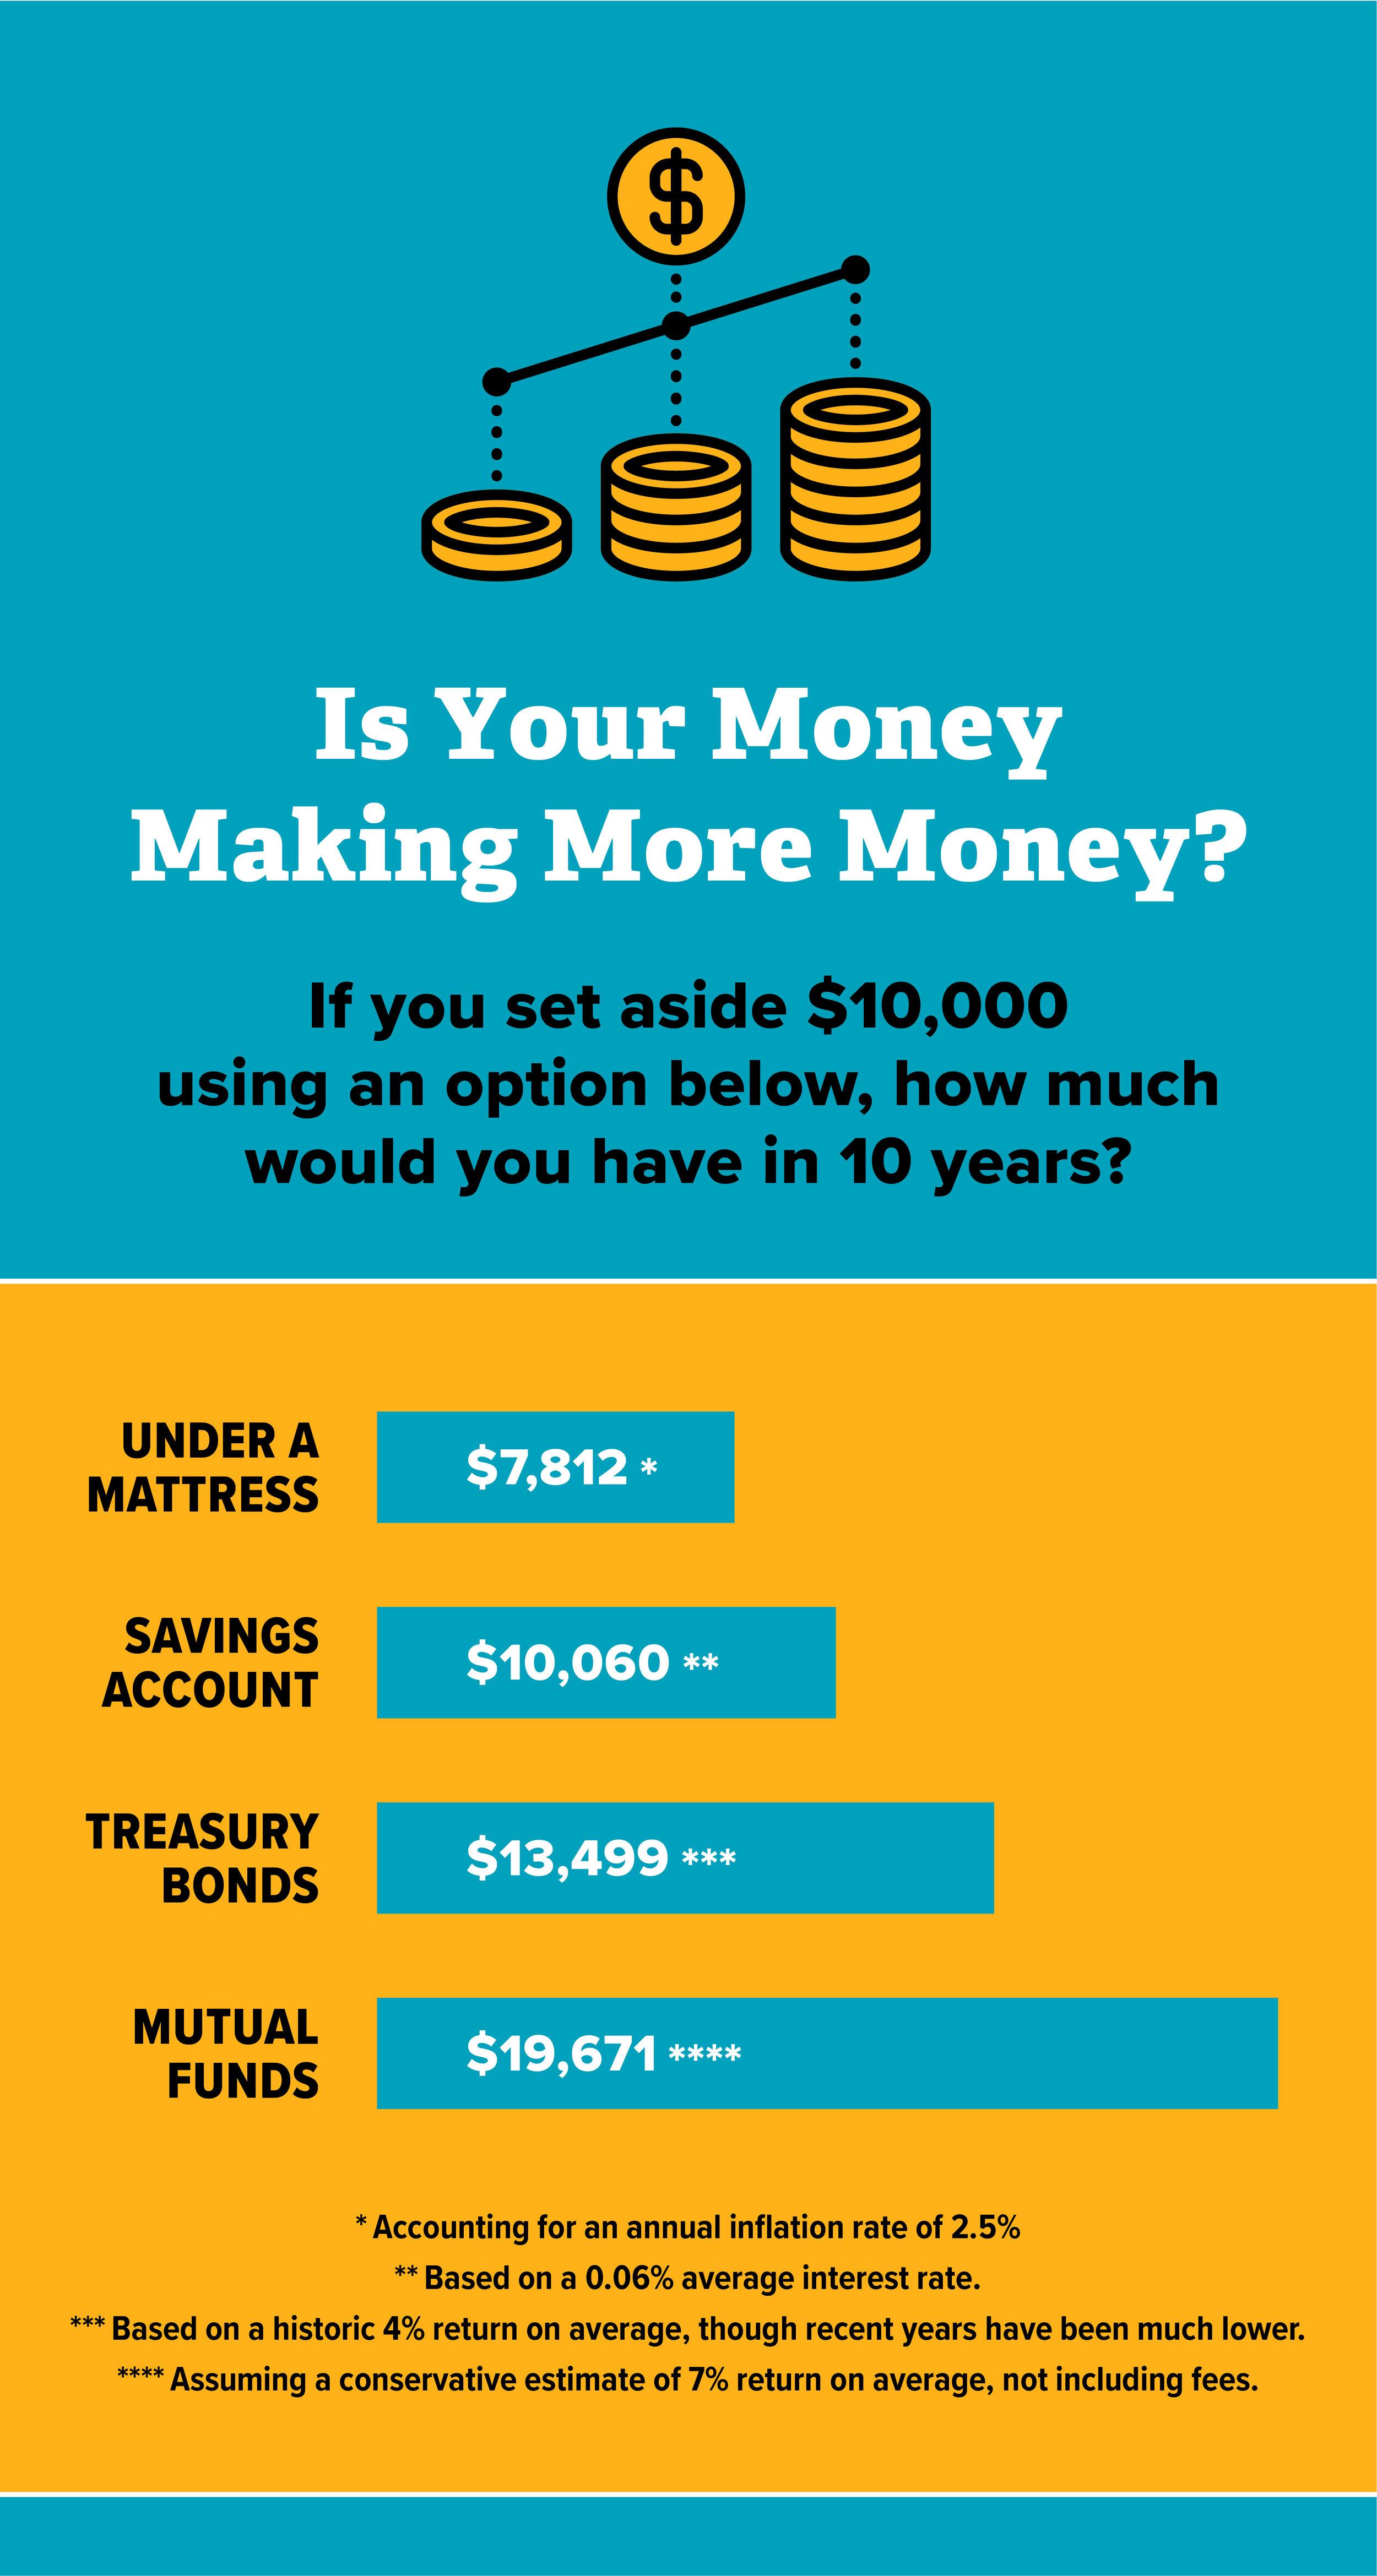 Is Your Money Making Money.jpg